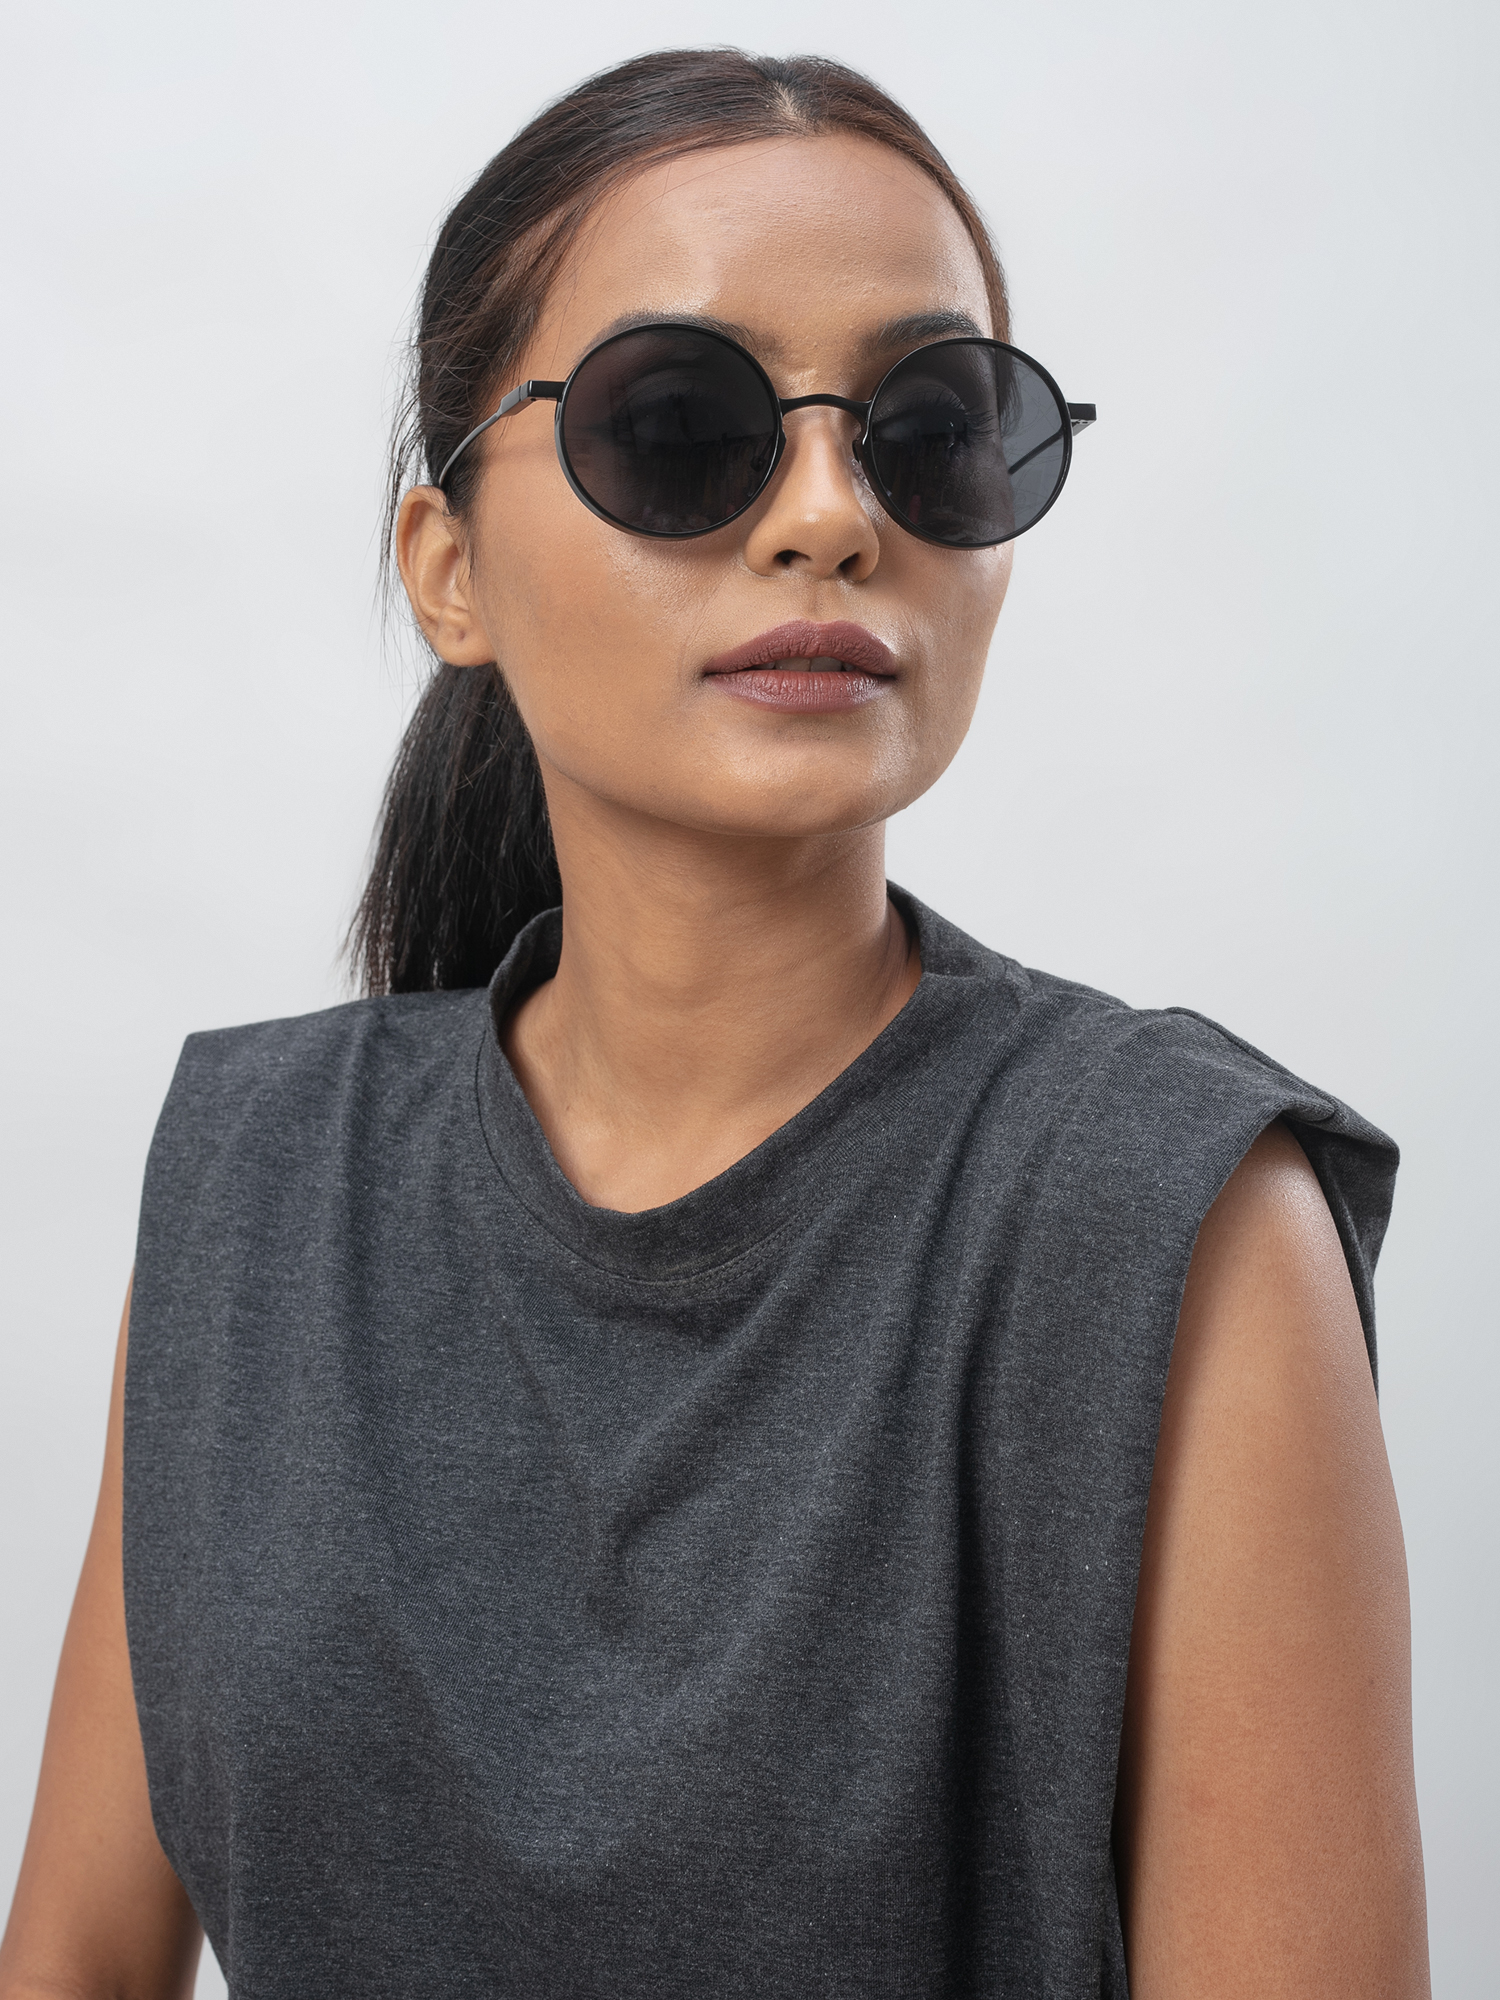 Sunglasses-Look For The Magic Sunglasses1